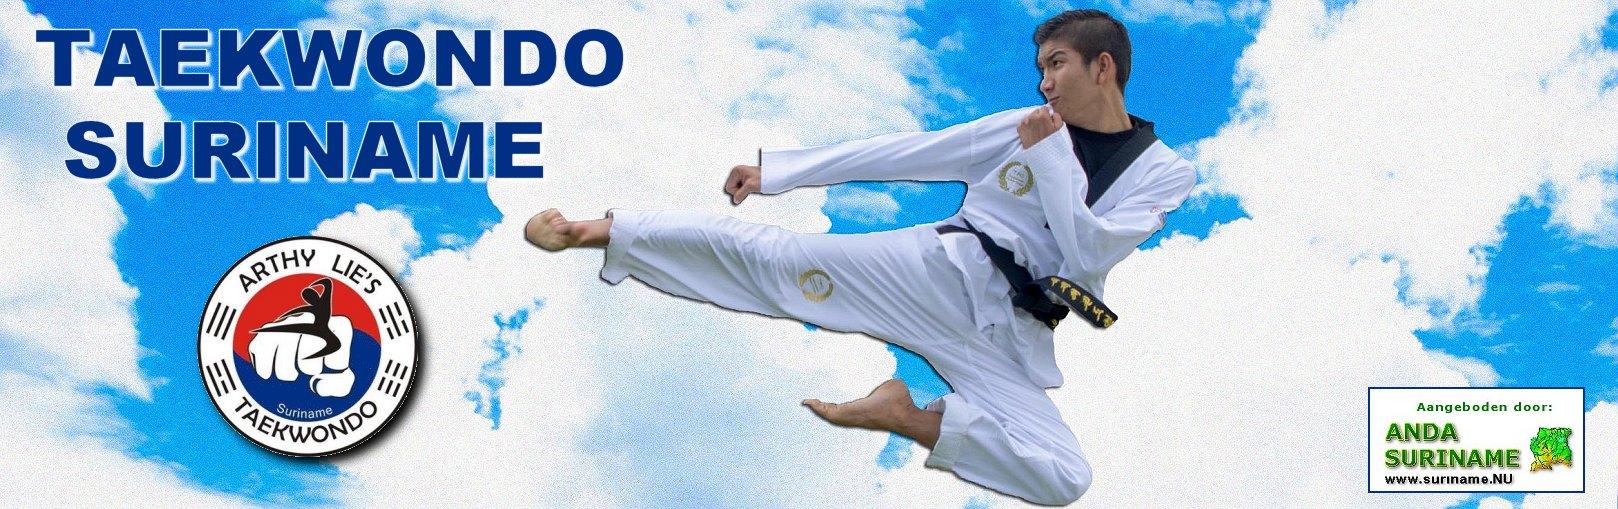 Suriname Taekwondo School Arthy Lie